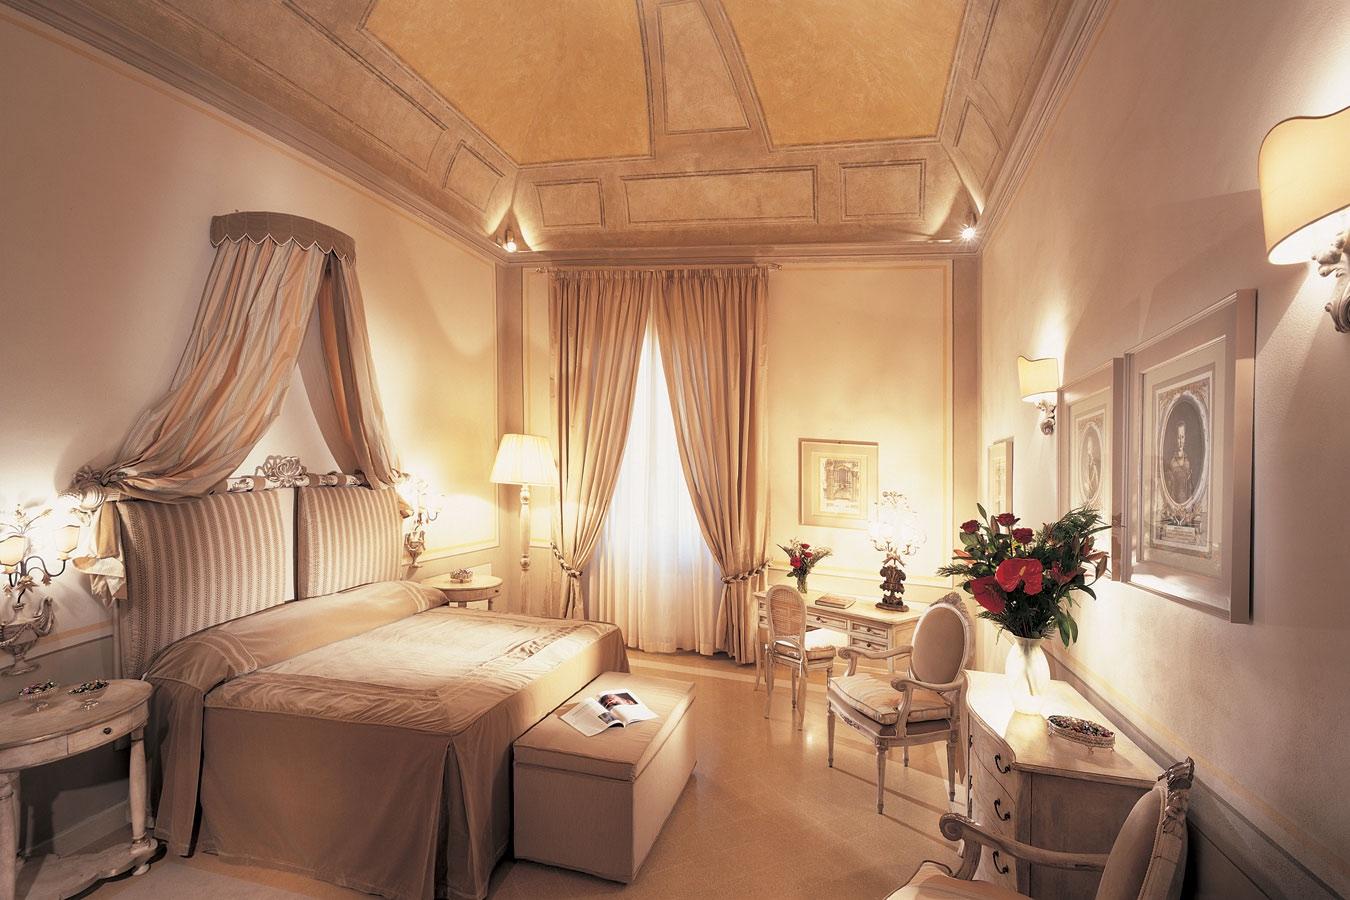 Bagni di Pisa Palace & Spa - The Luxury Spa Edit